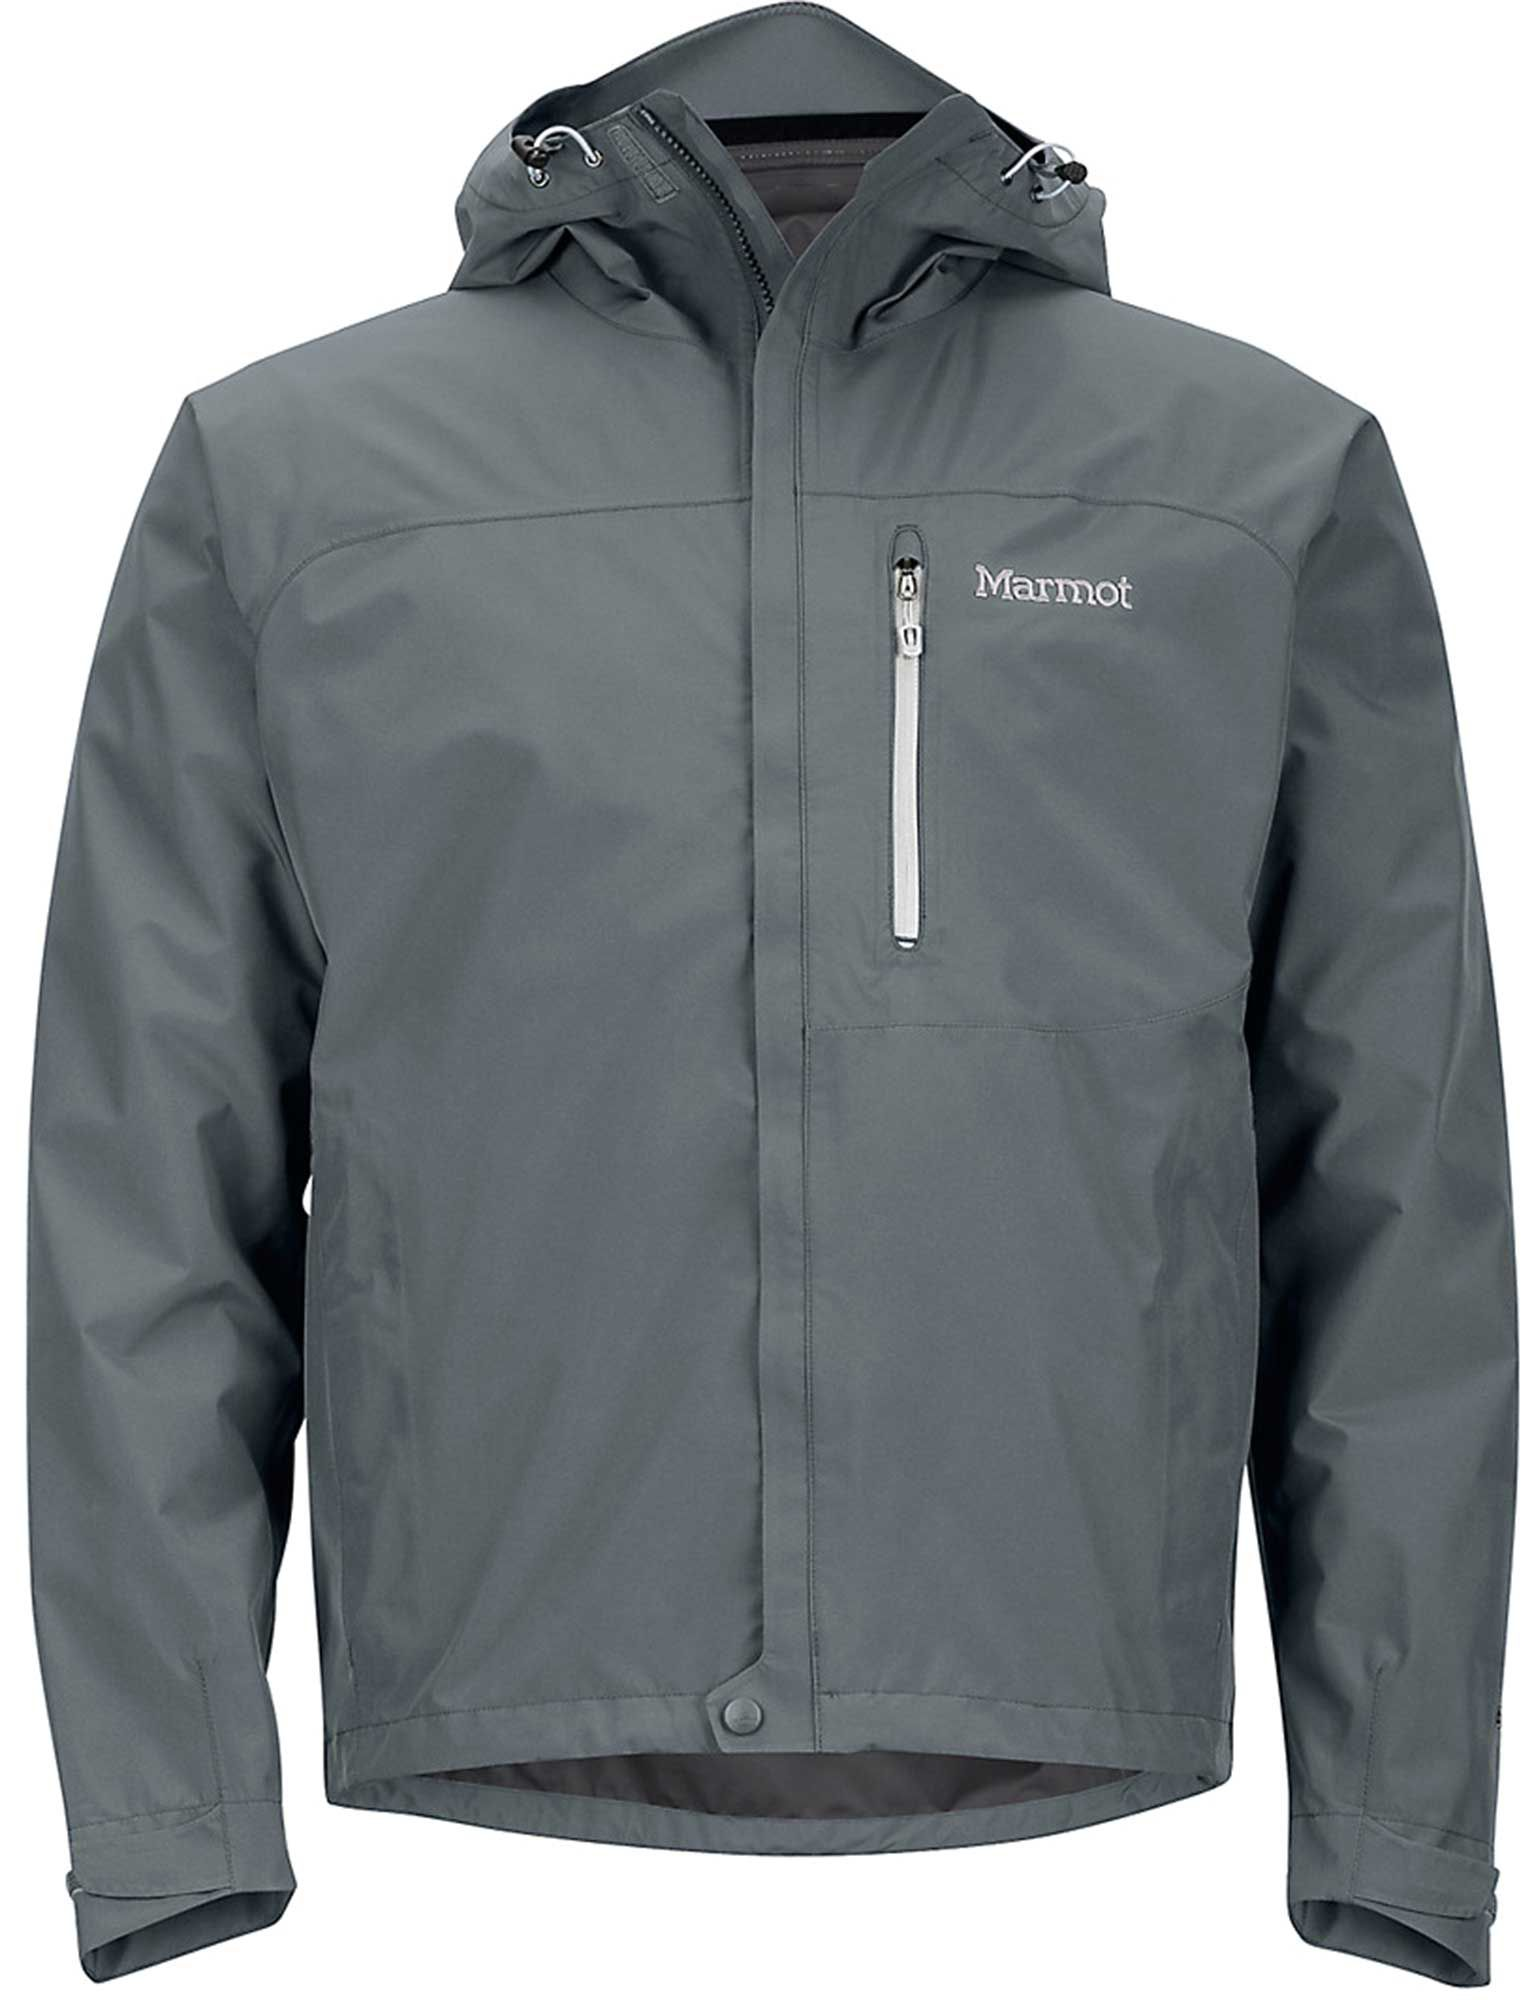 Marmot men's jacket - Noimagefound